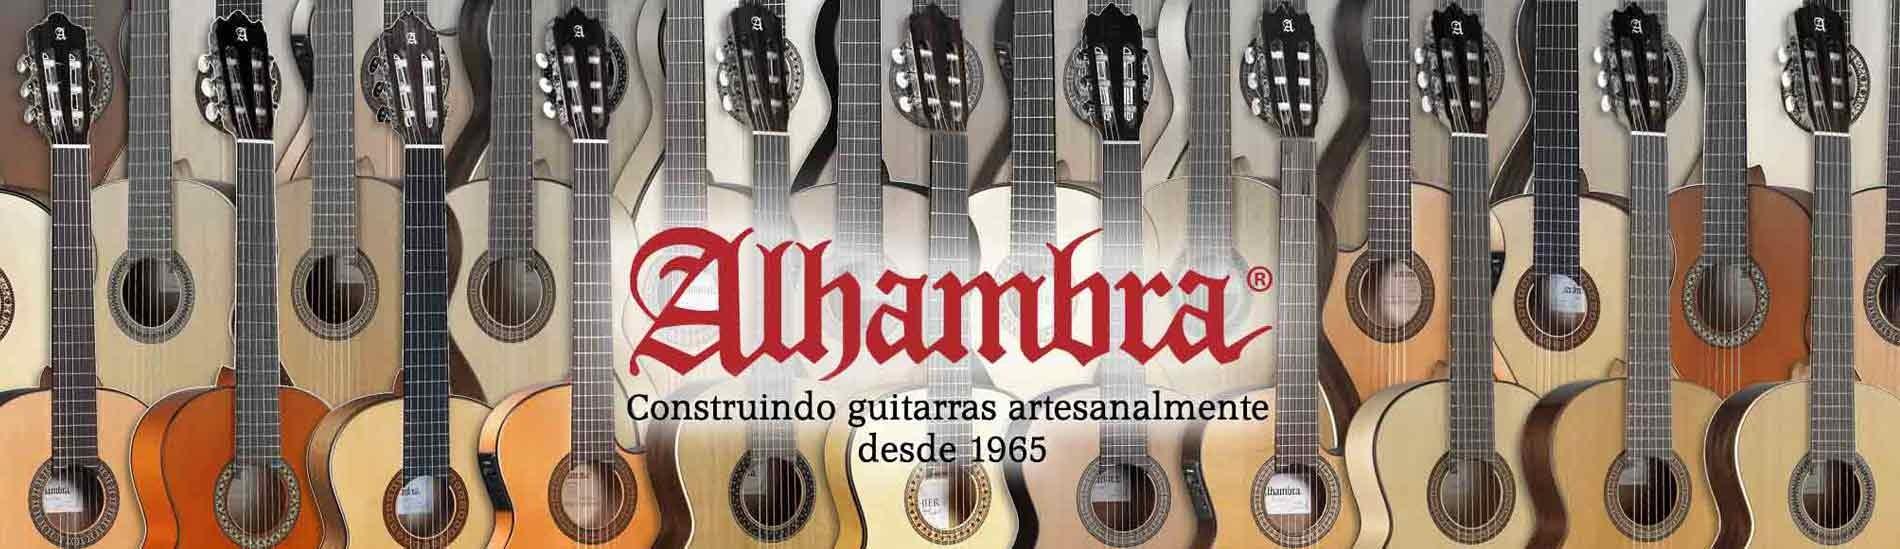 Guitarras Alhambra desde 1965